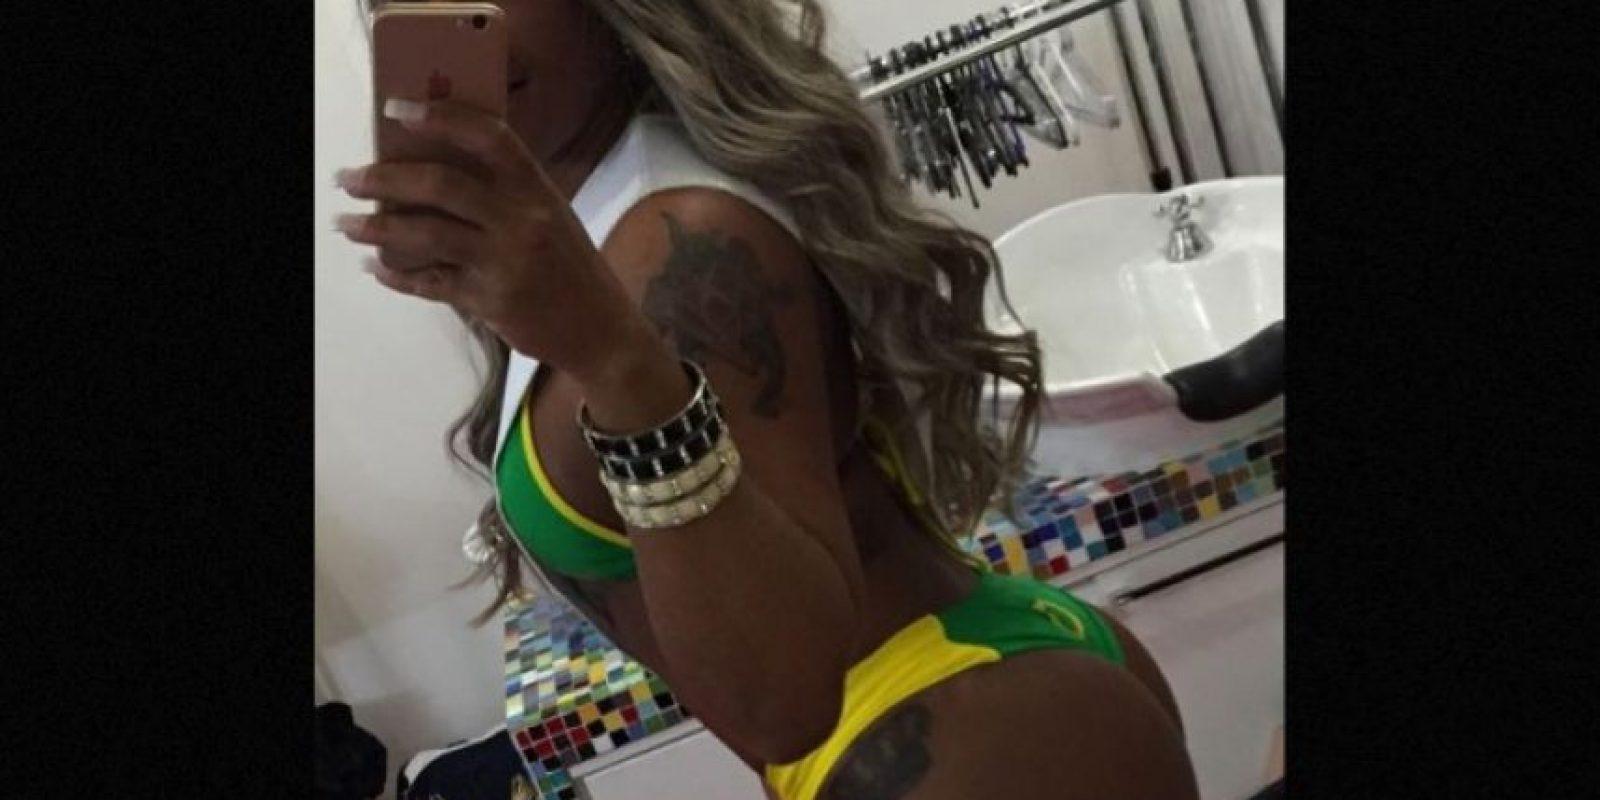 Daiana Nogueira de Sergipe Foto:Instagram/ daiananogueiraoficial